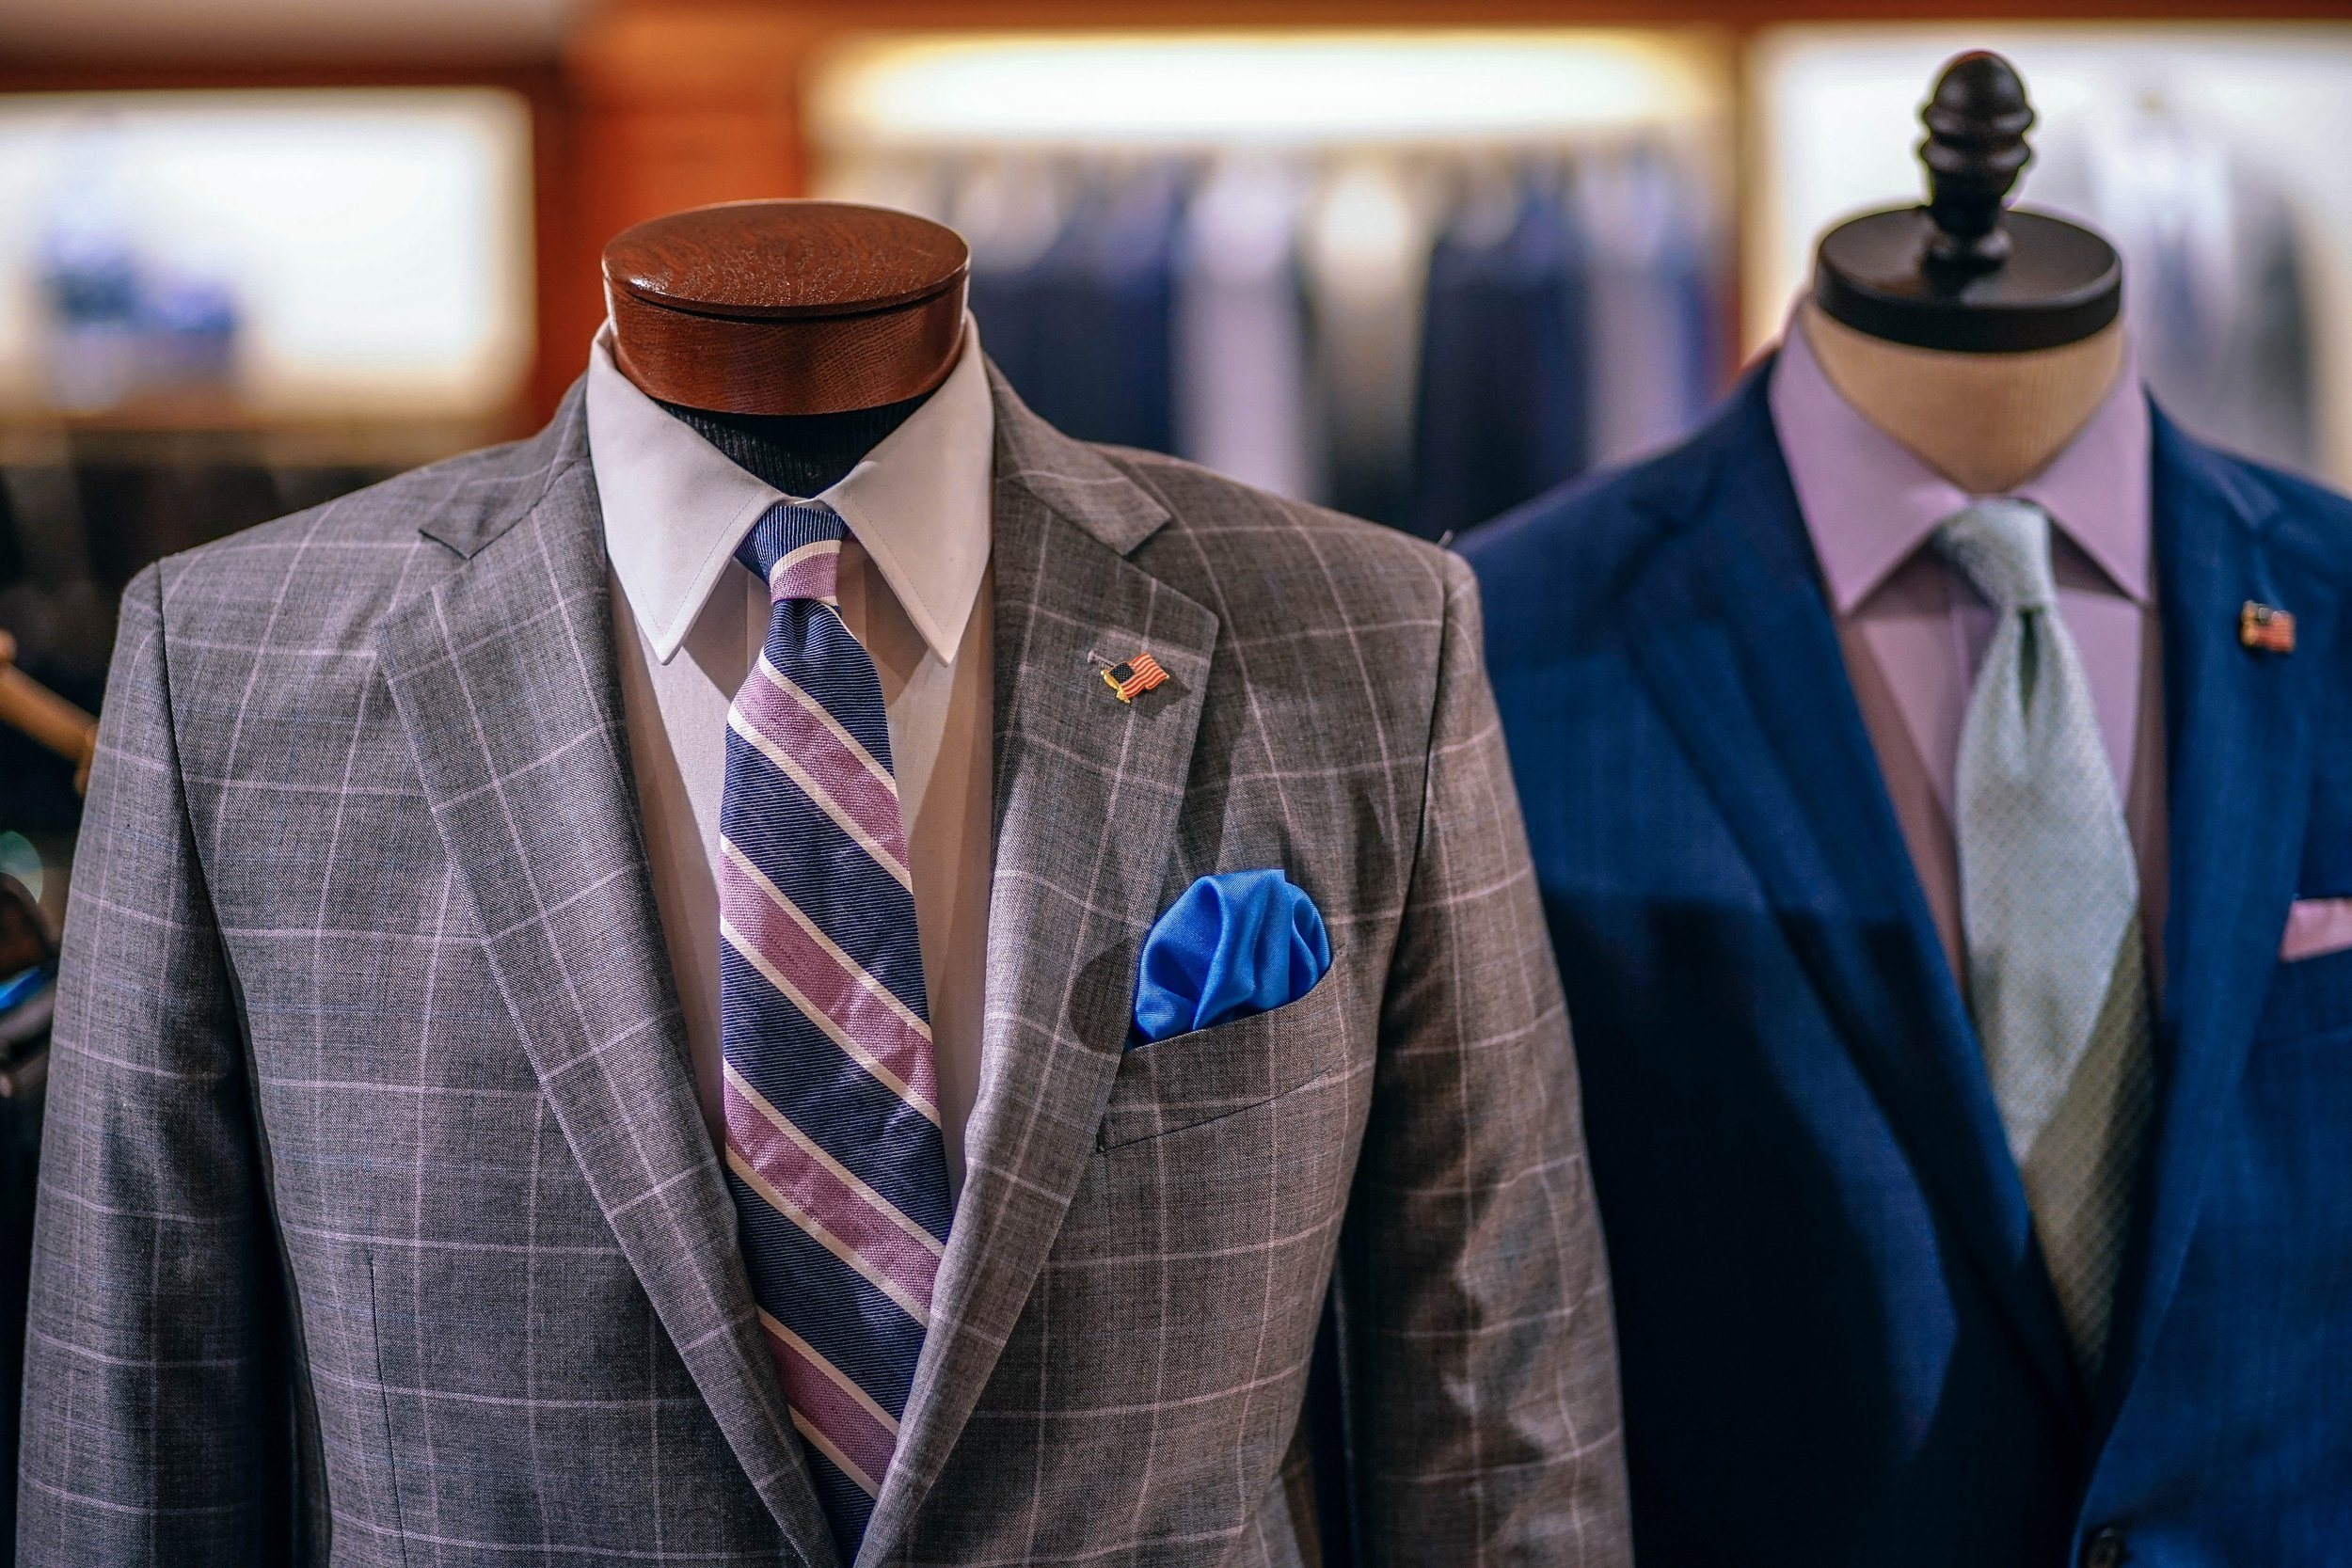 blur-boutique-close-up-404171.jpg